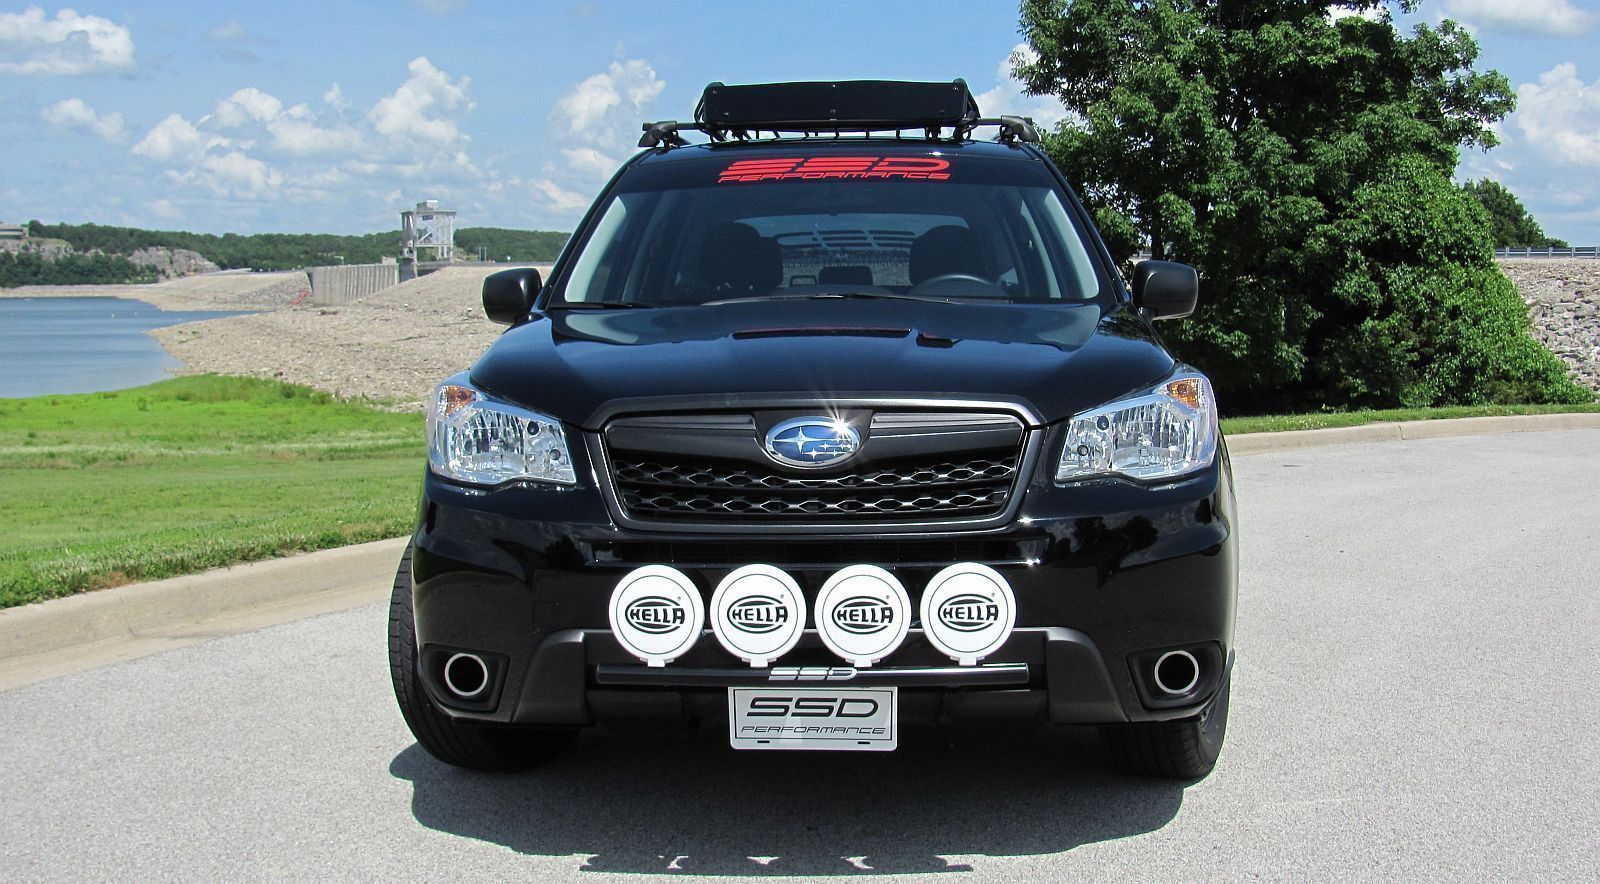 Amazing fits 2016 subaru forester 25 xt rally light bar4 light cool amazing fits 2016 subaru forester 25 xt rally light bar4 light mounting aloadofball Gallery